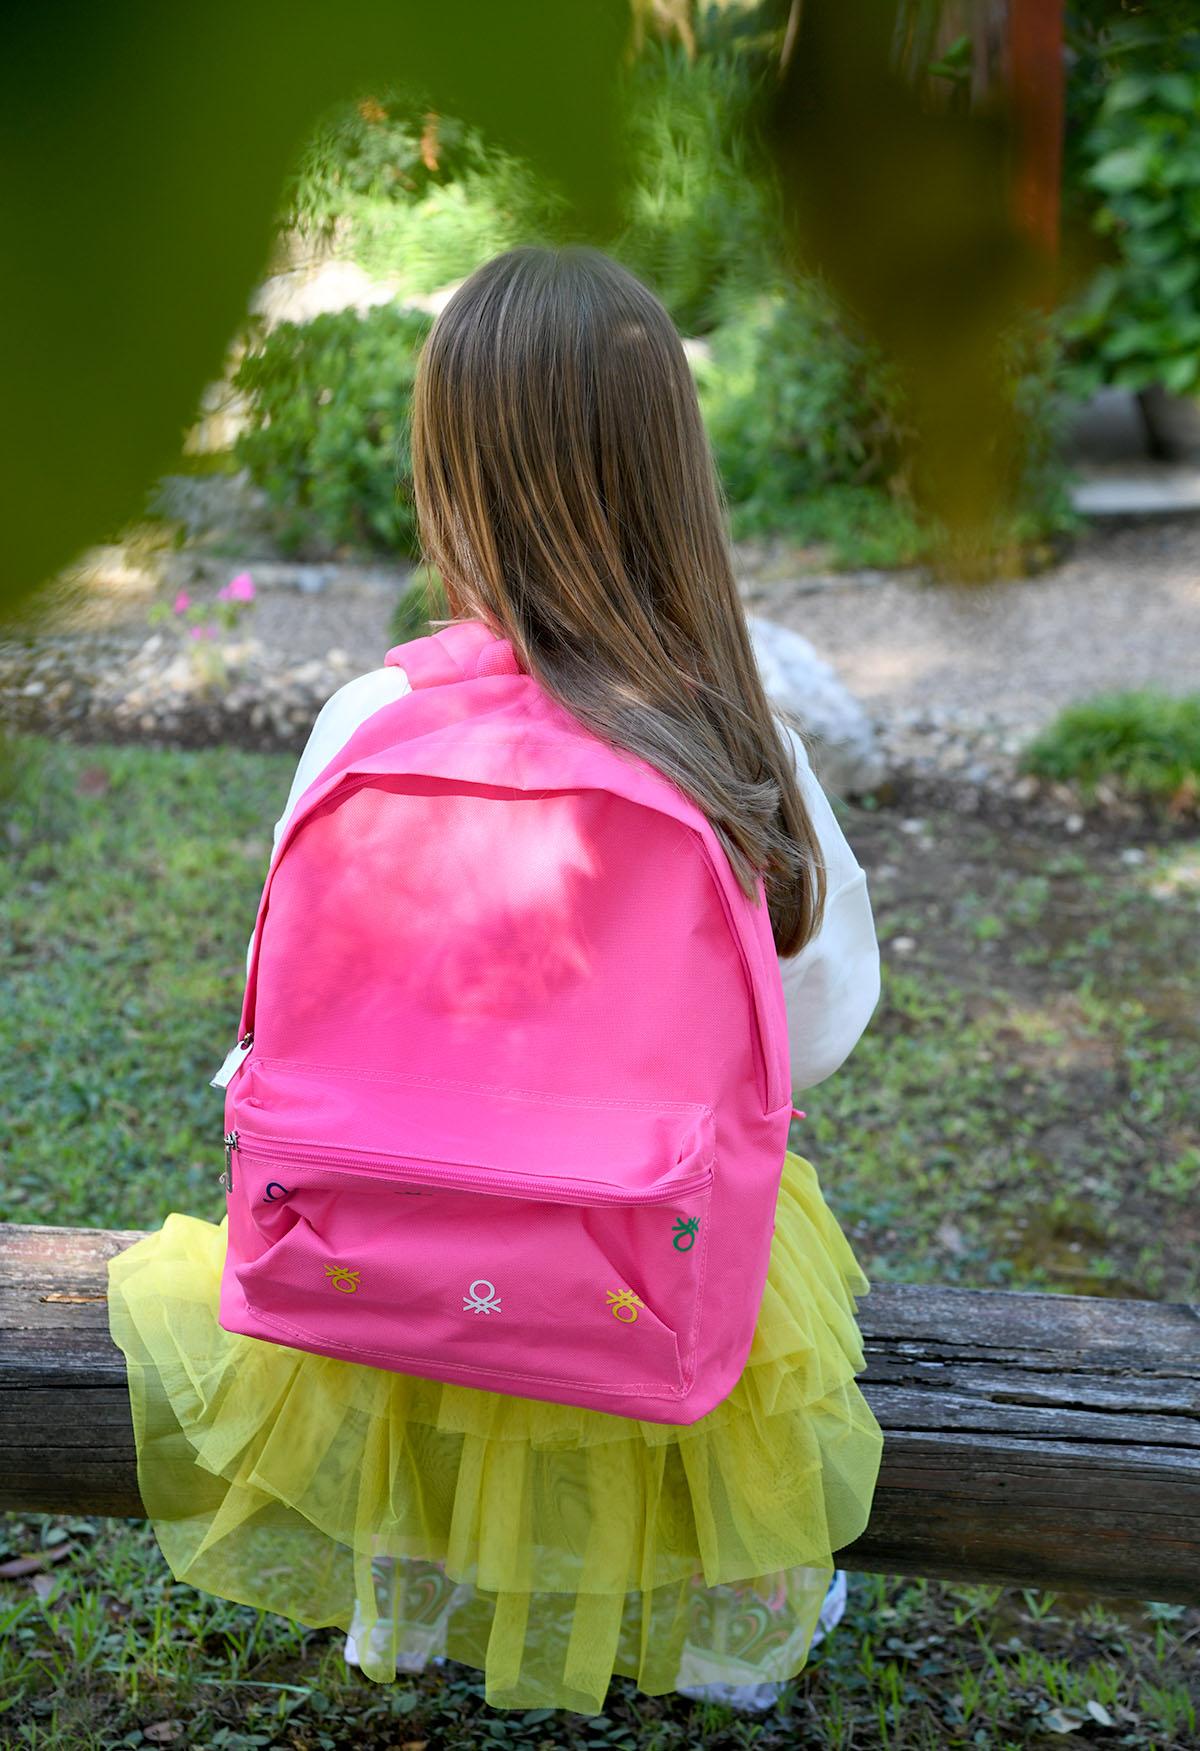 Extravagant editorijal: Back to school